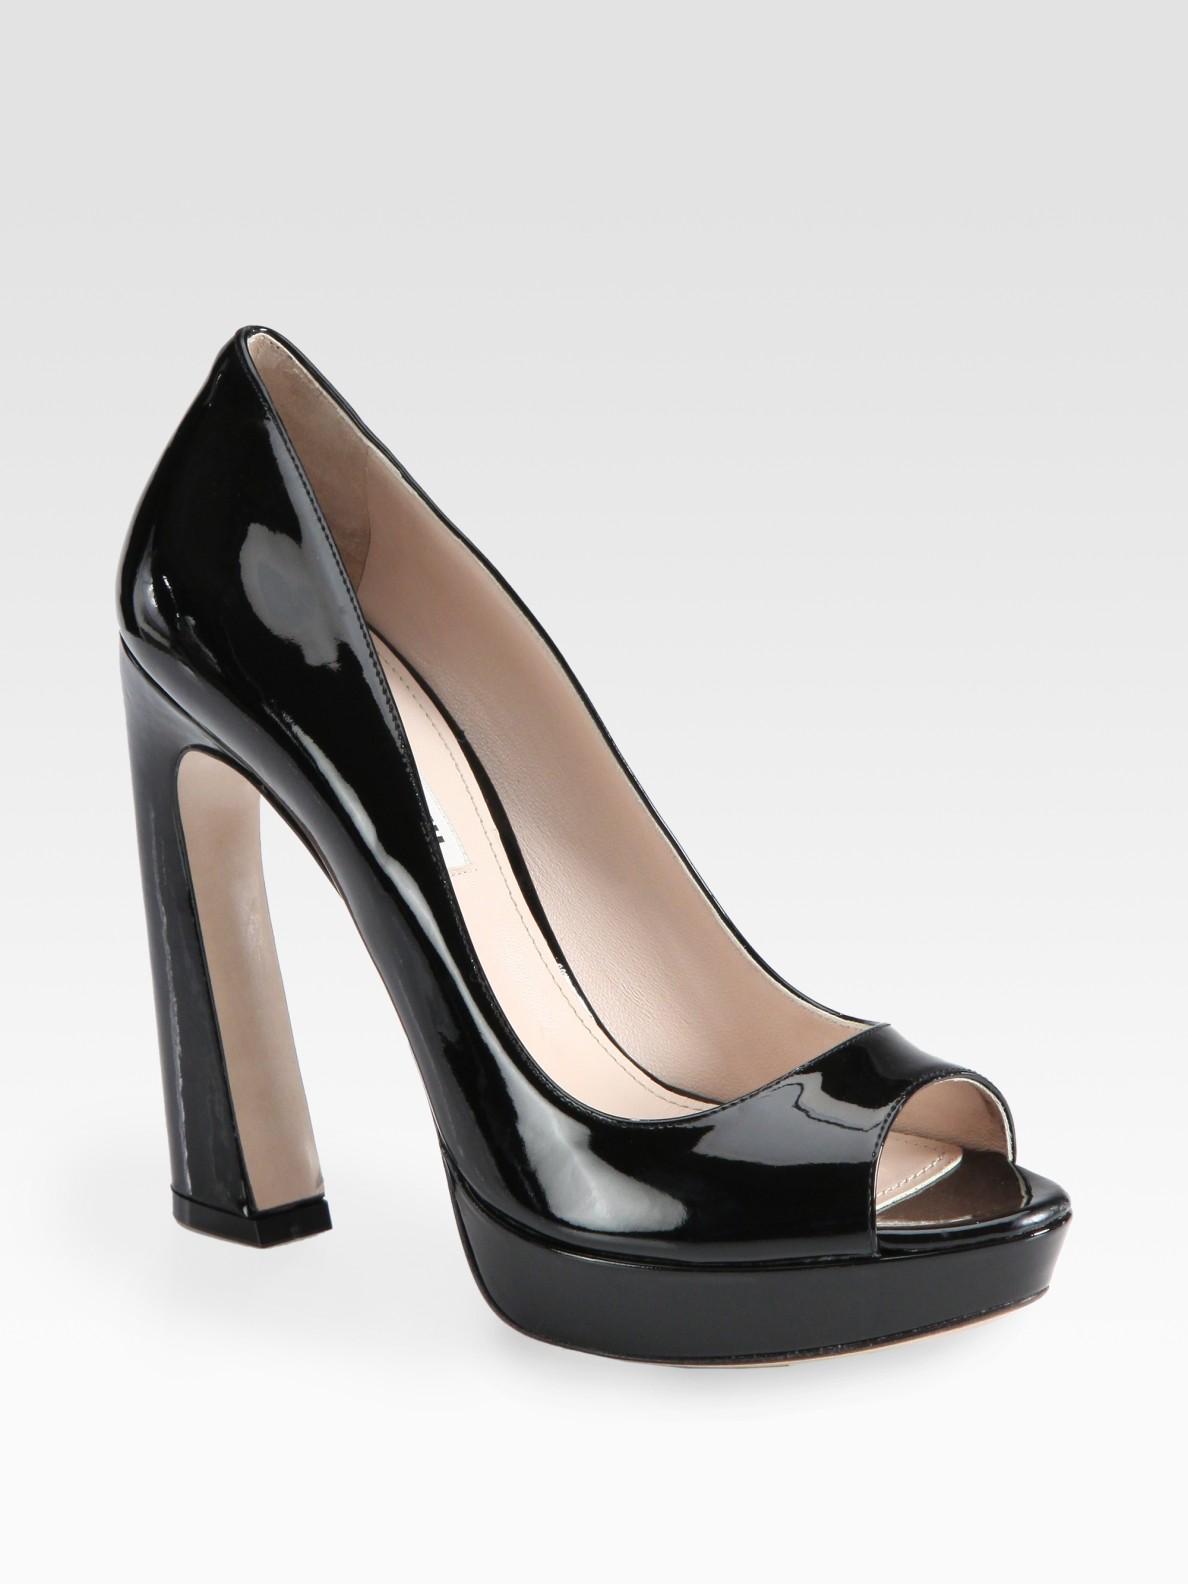 Lyst Miu Miu Patent Leather Peep Toe Flared Heel Pumps